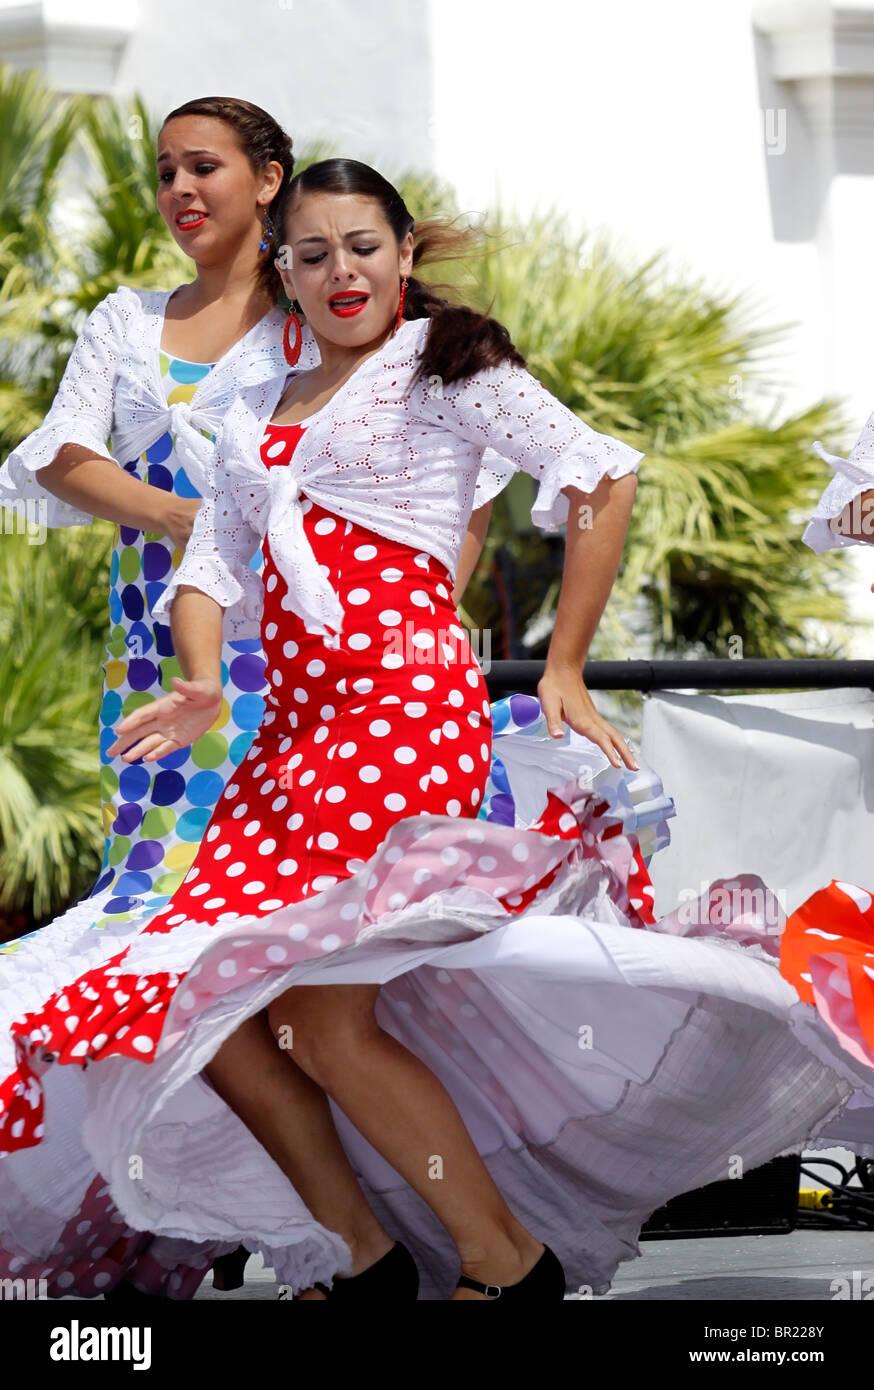 Flamenco dancers perform during Old Spanish Days celebration in Santa Barbara, California - Stock Image